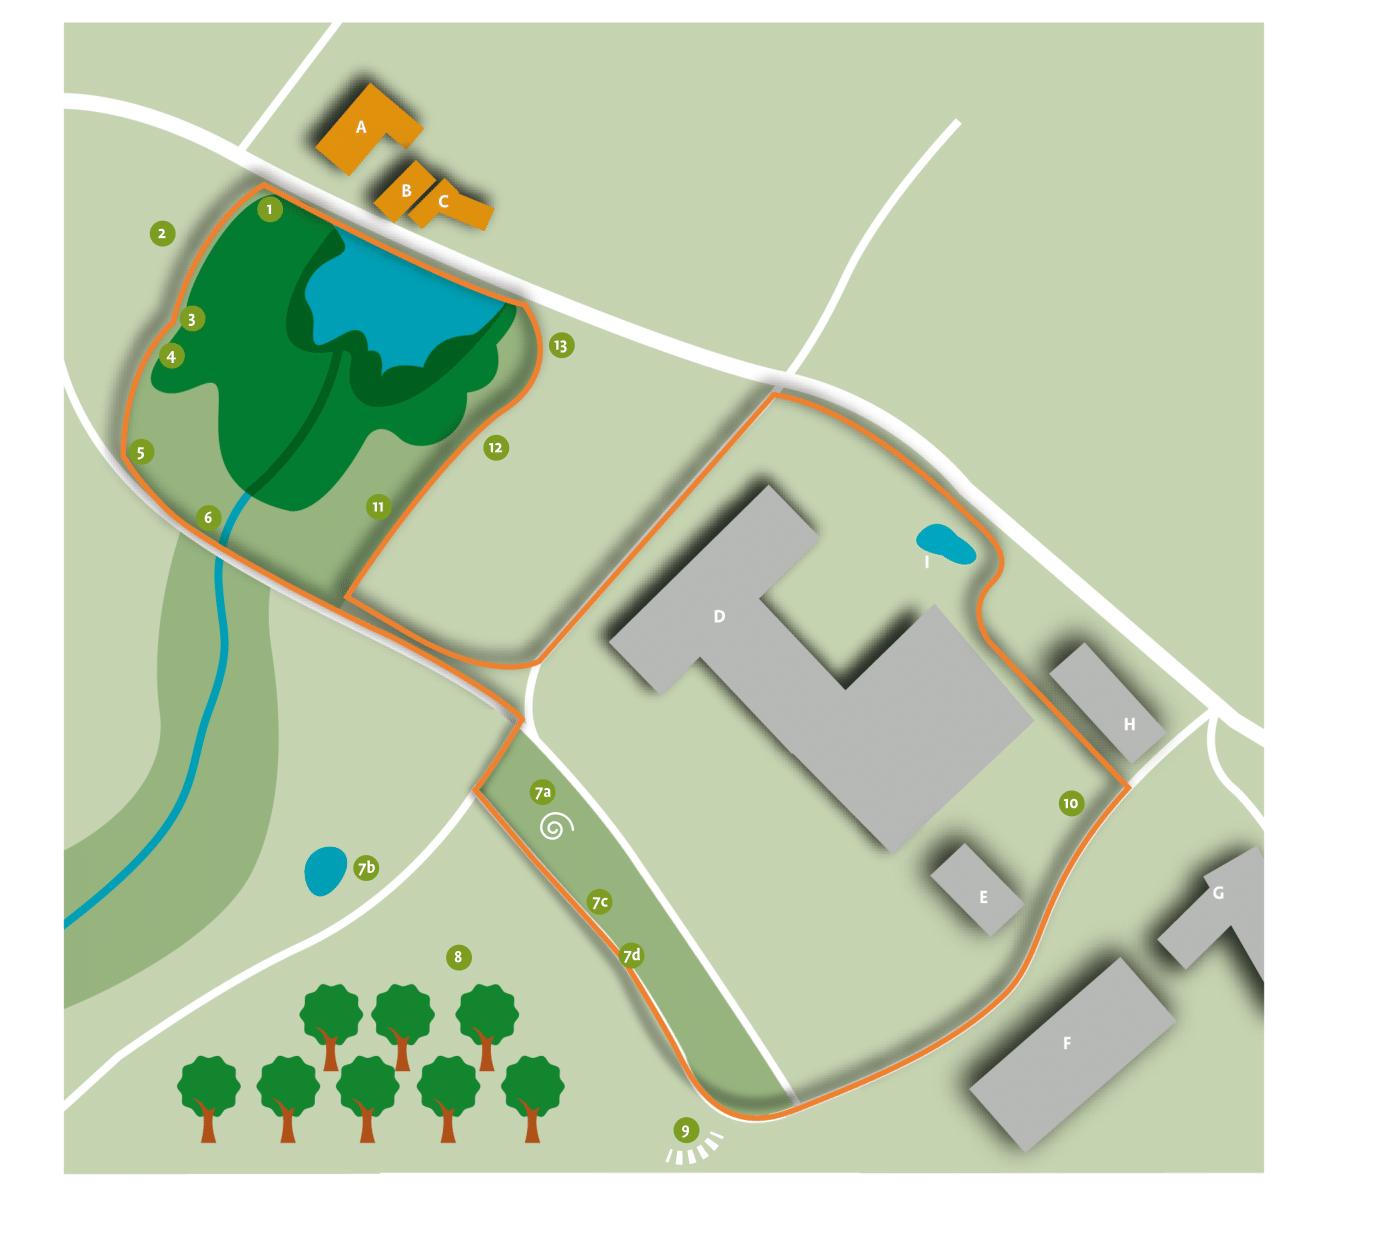 plan-corr-1.png